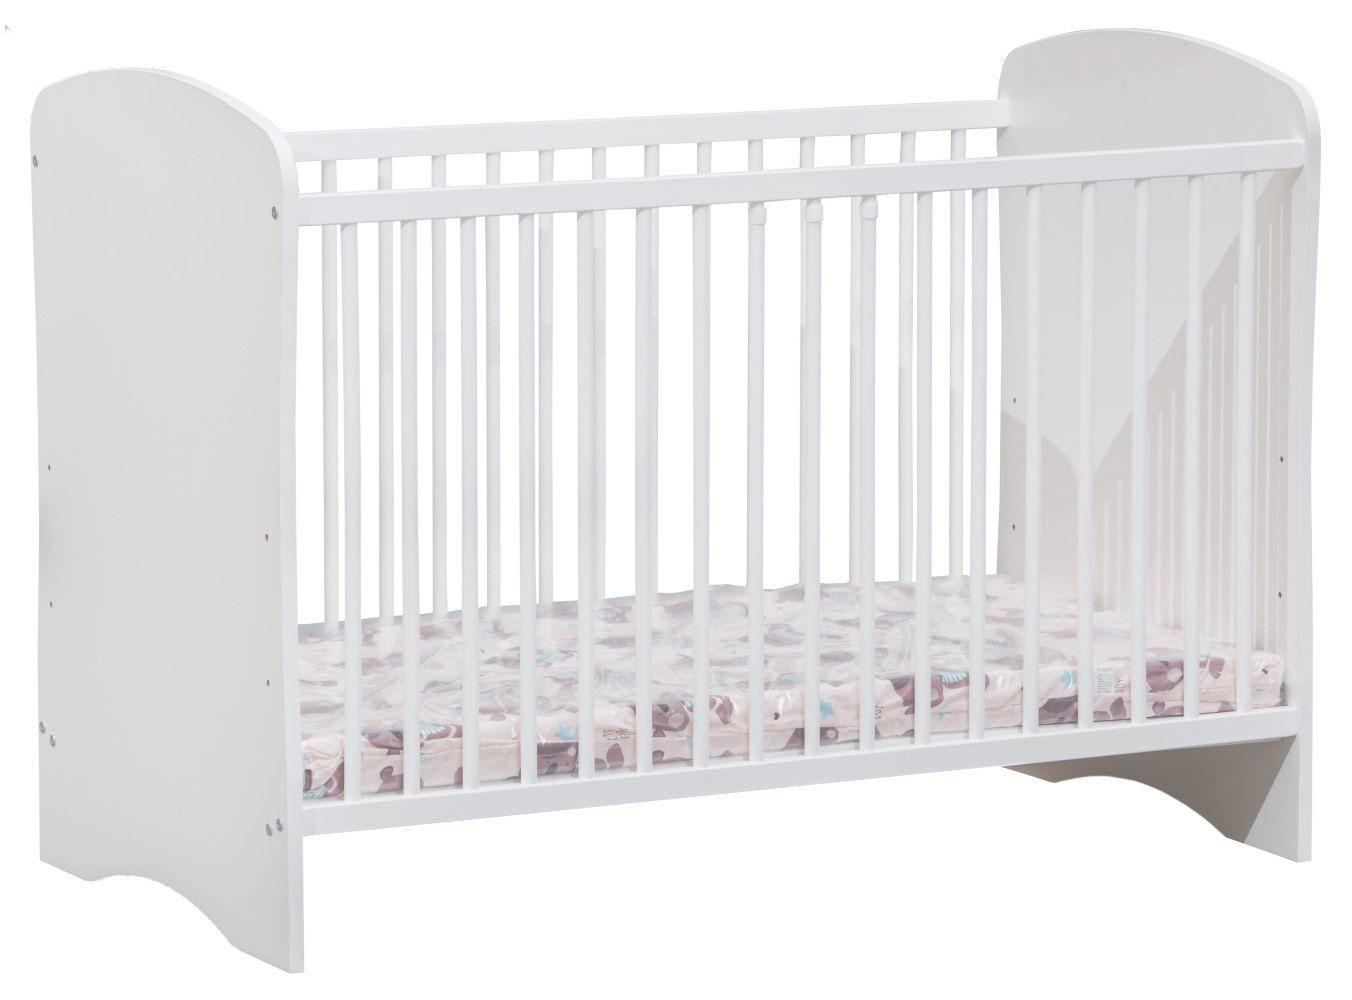 Babyzimmer Regal Maipu 03, Farbe: Weiß 173 x 40 x 30 cm